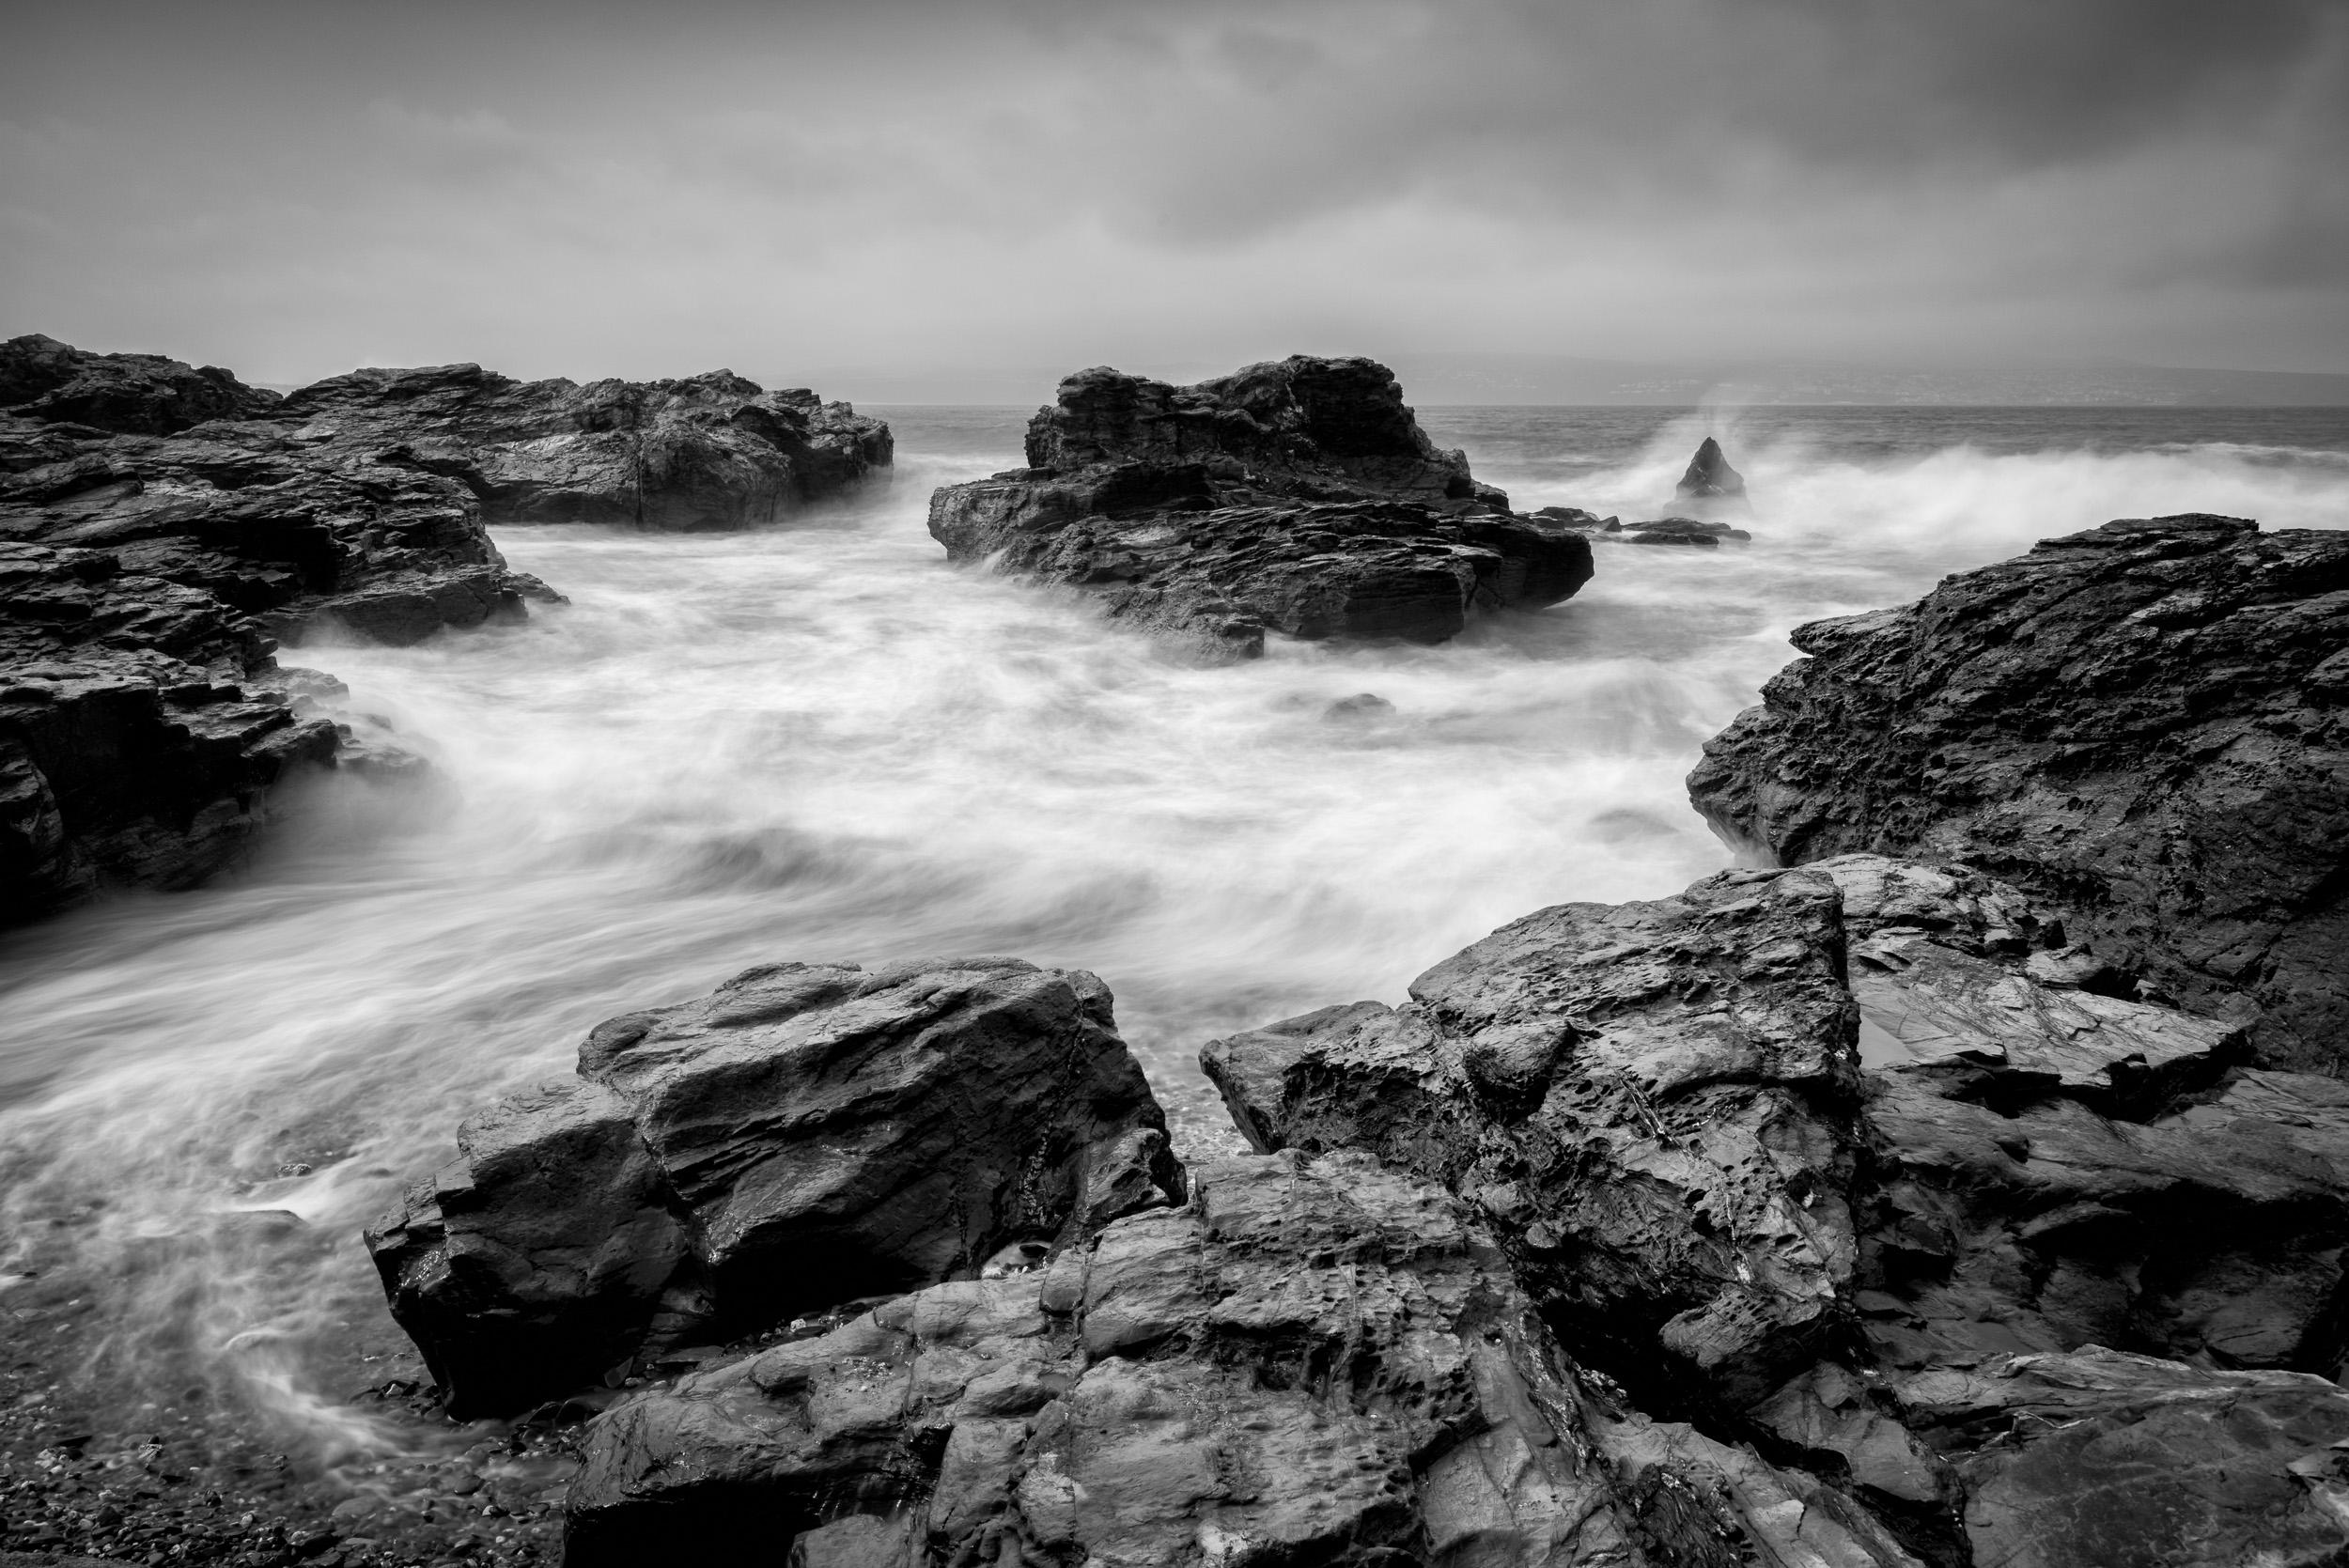 Godrevy Cove, Cornwall